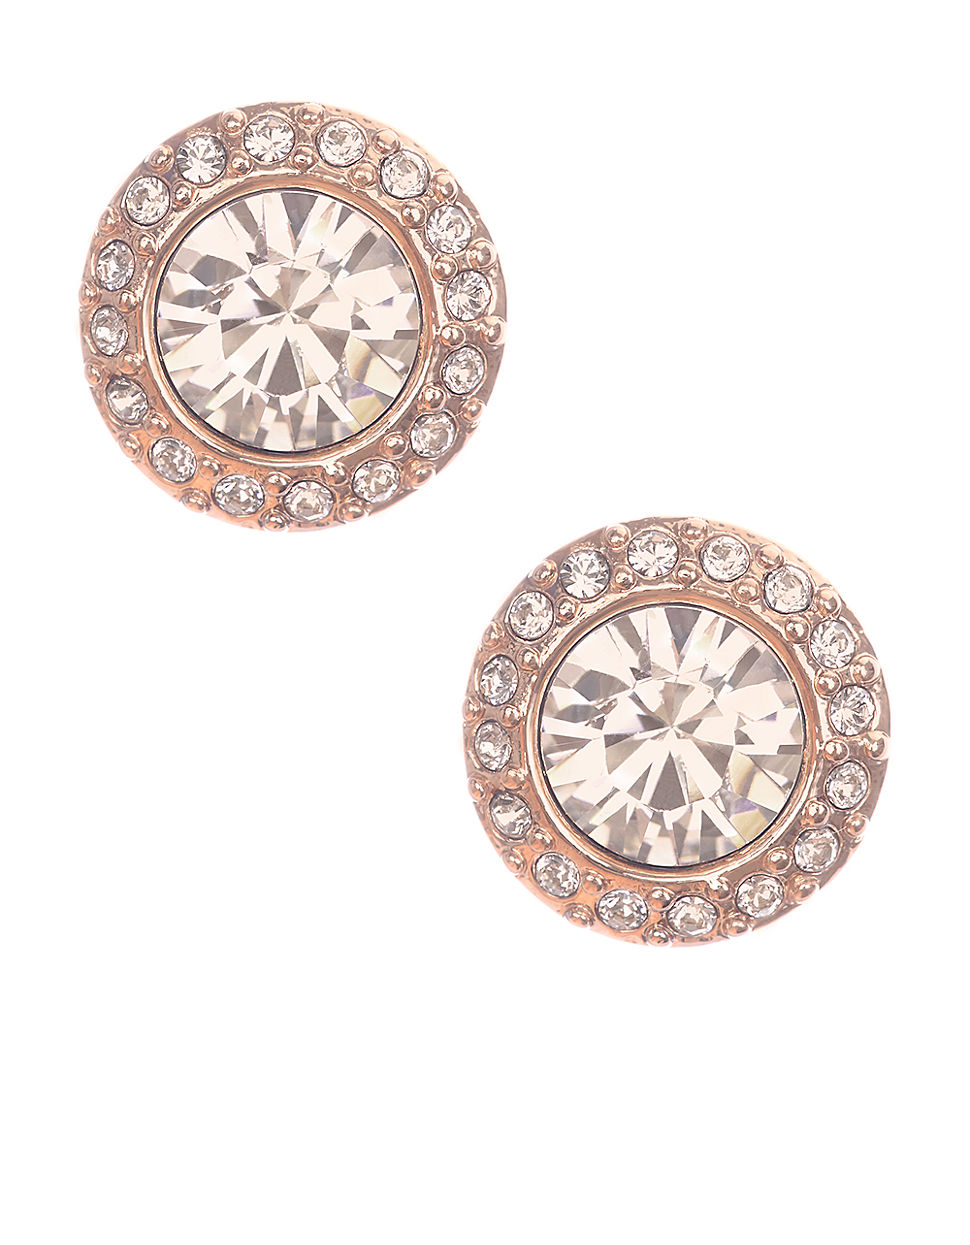 Rose Goldtone And Swarovski Crystal Stud Earrings